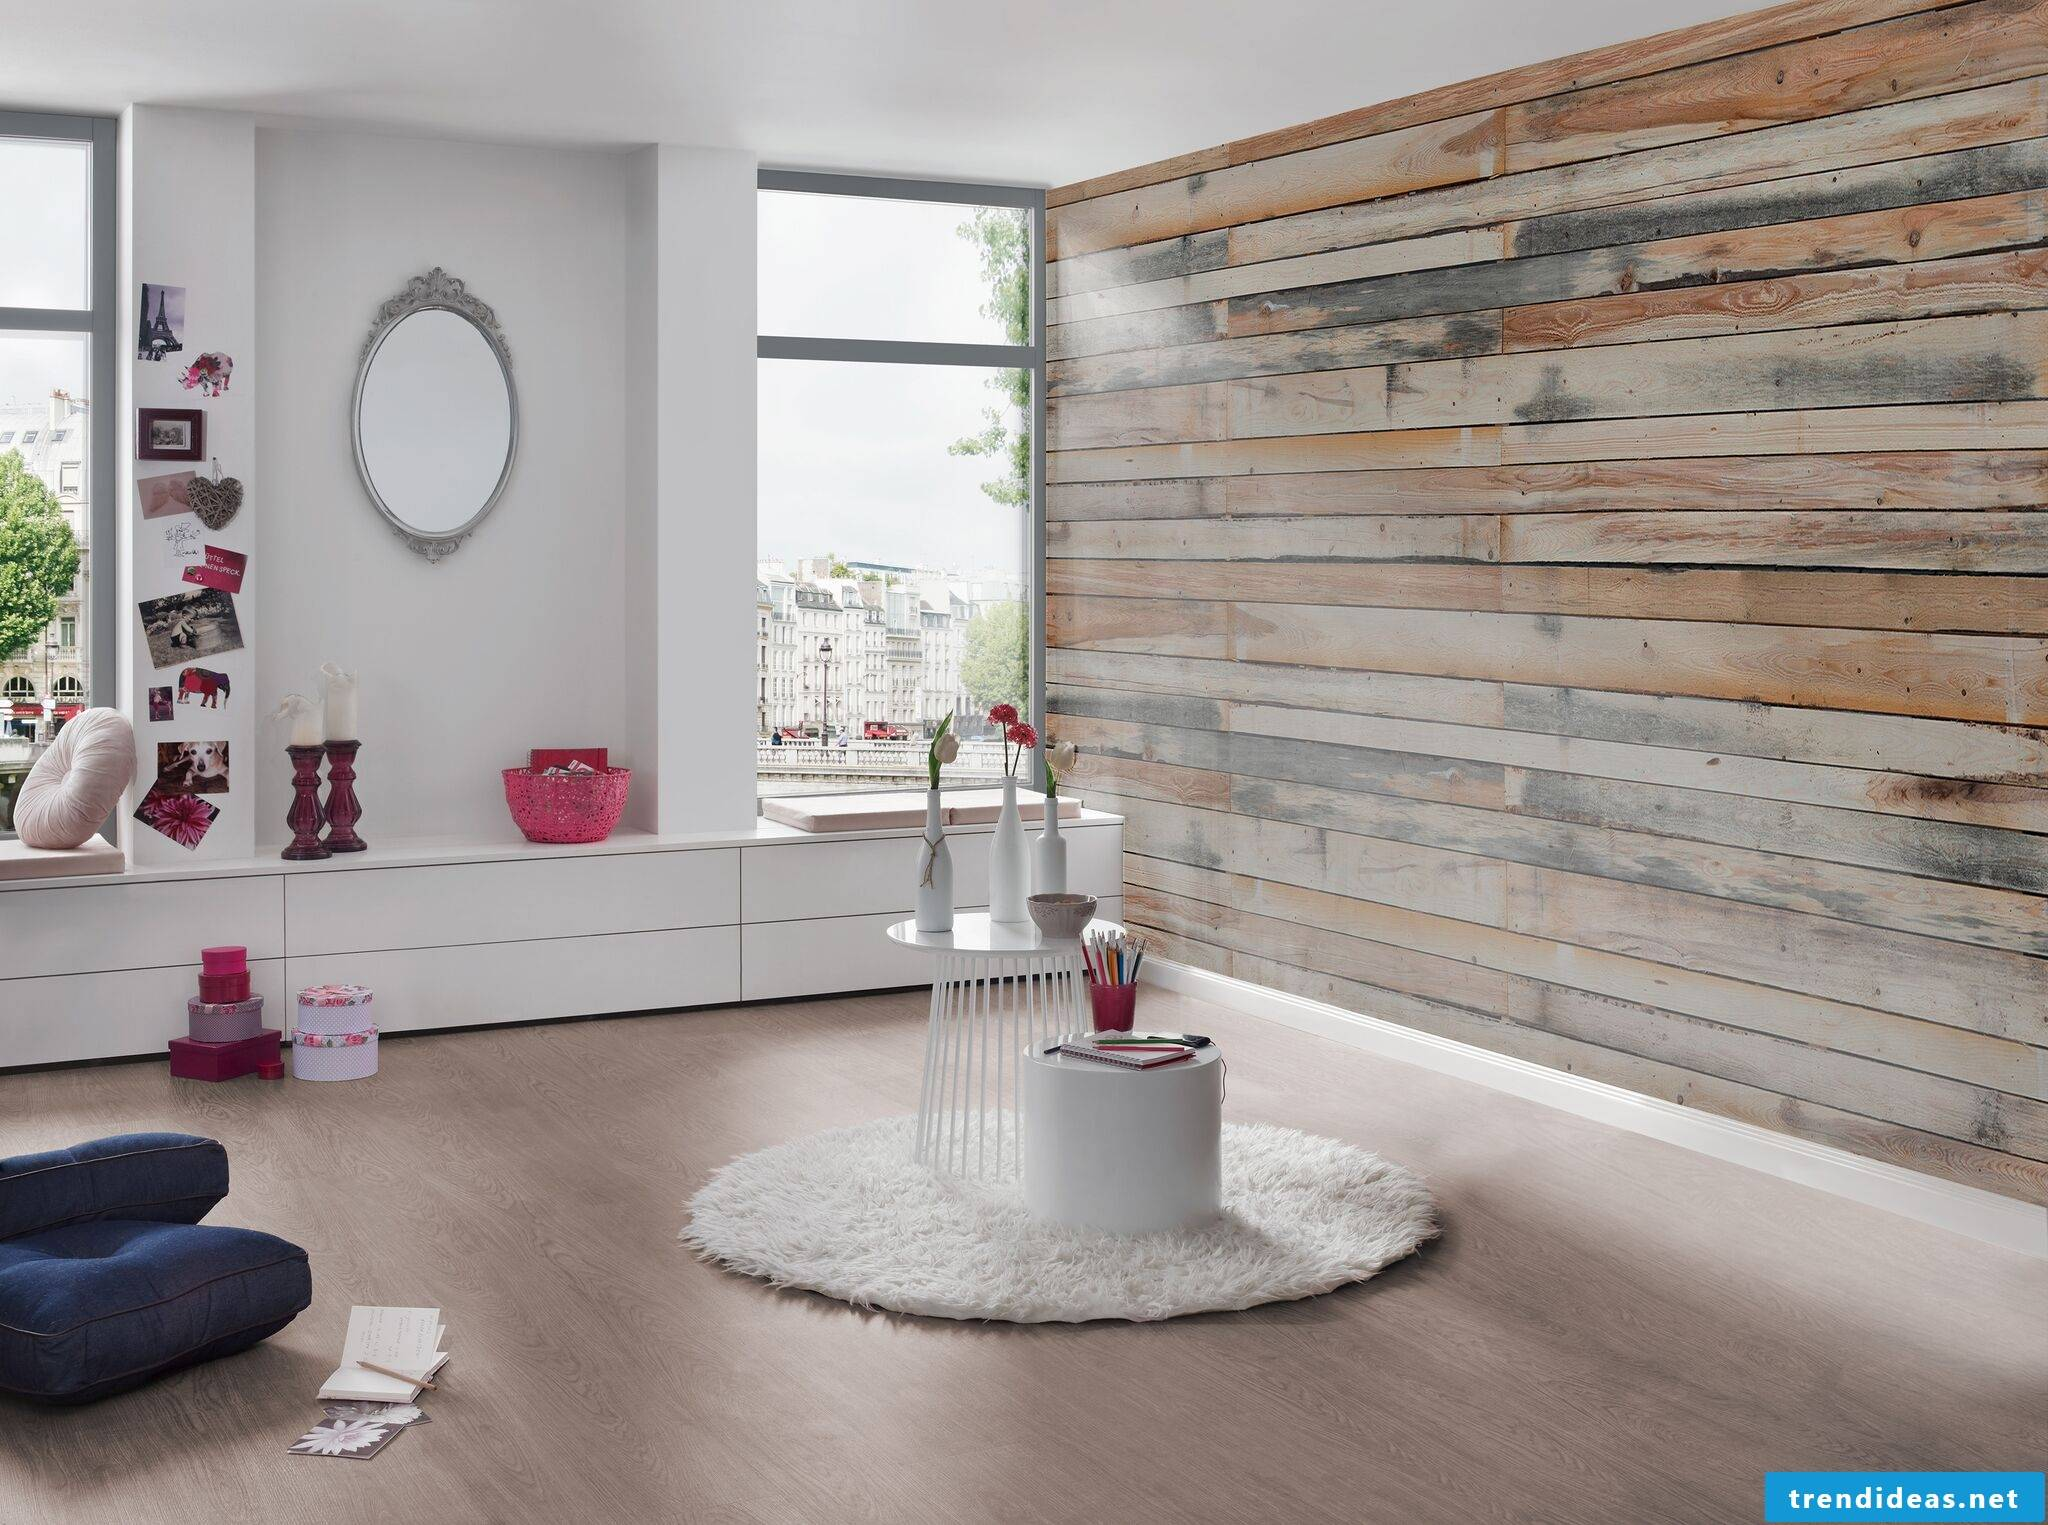 Wallpaper in wood look in the living room